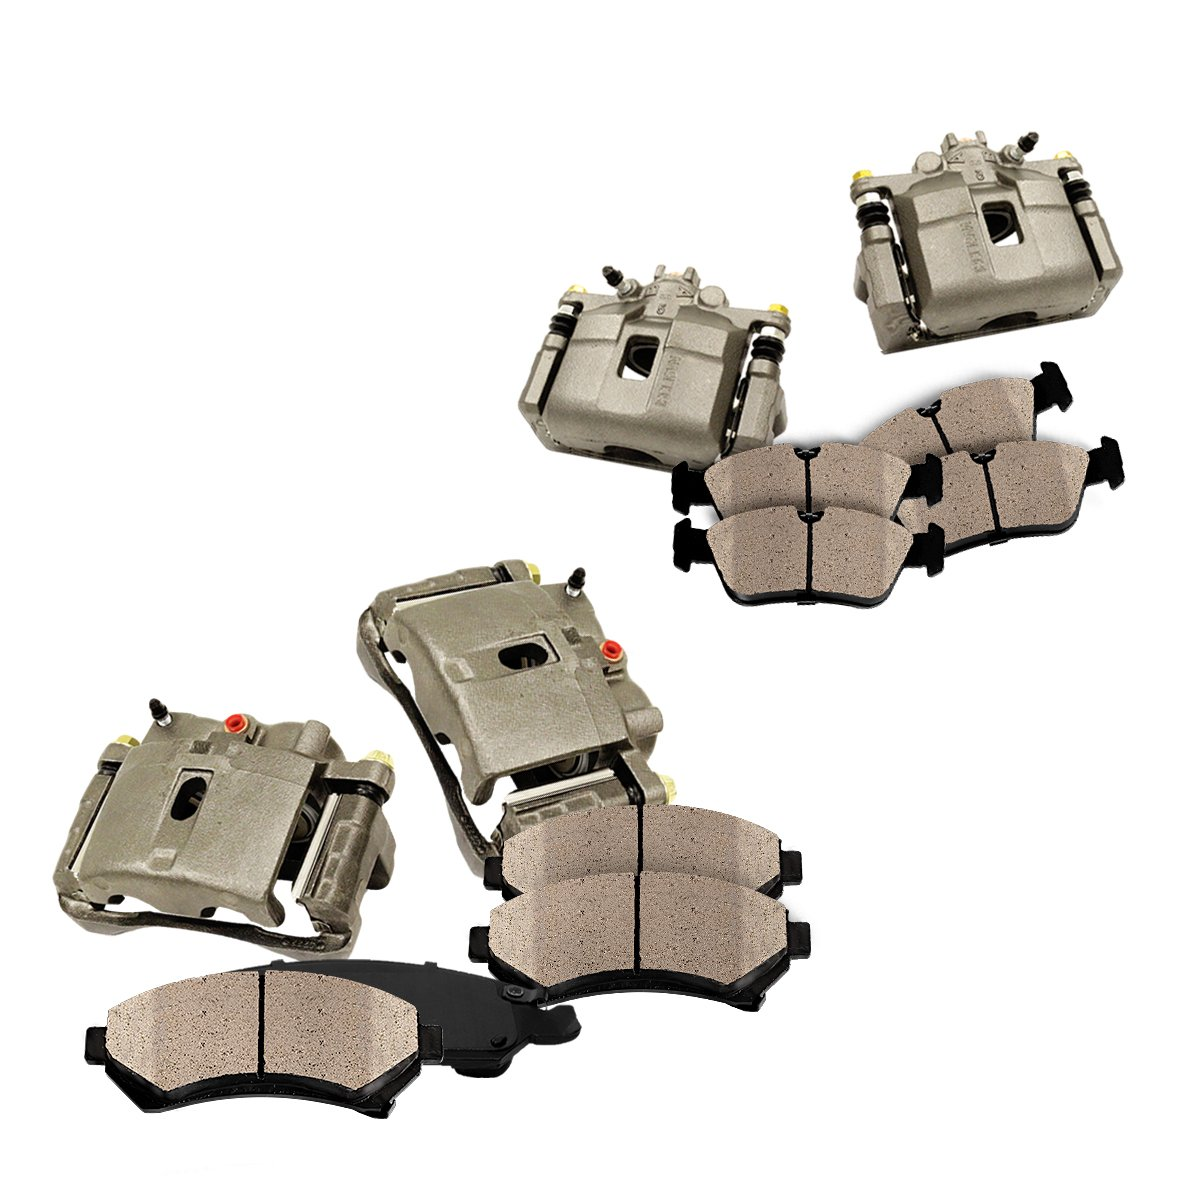 FRONT + REAR [ 4 ] Premium Grade OE Caliper + Ceramic Brake Pads Kit by Callahan Brake Parts